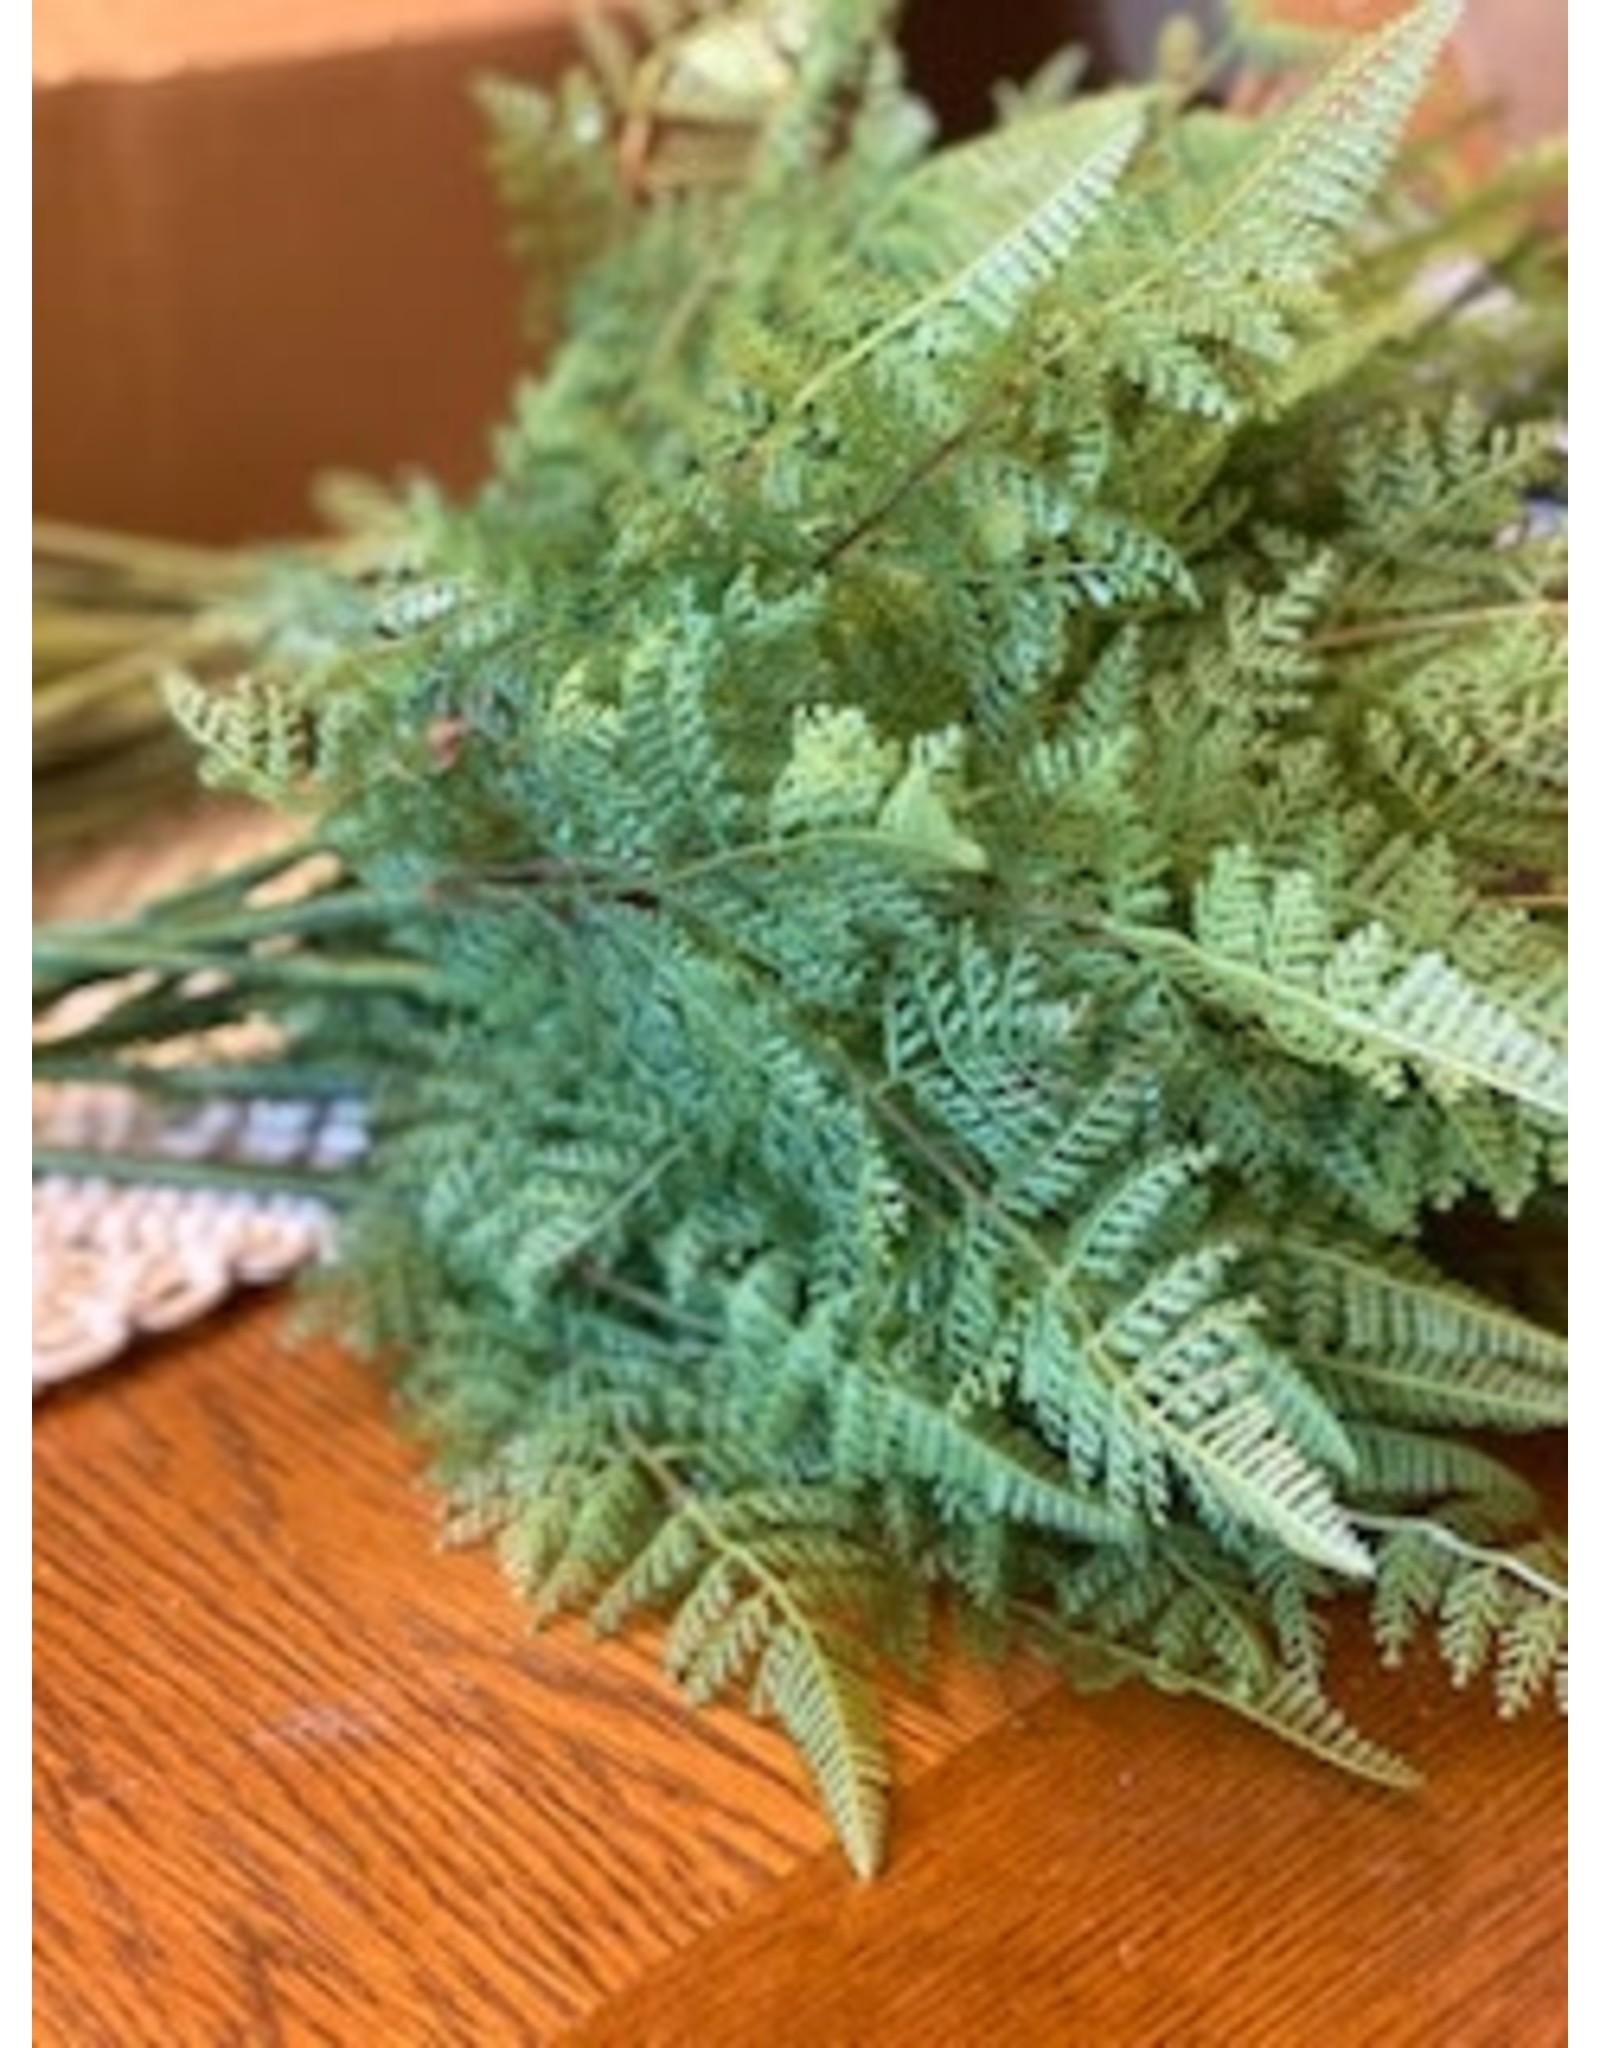 The Florist & The Merchant Small Fern Bundle